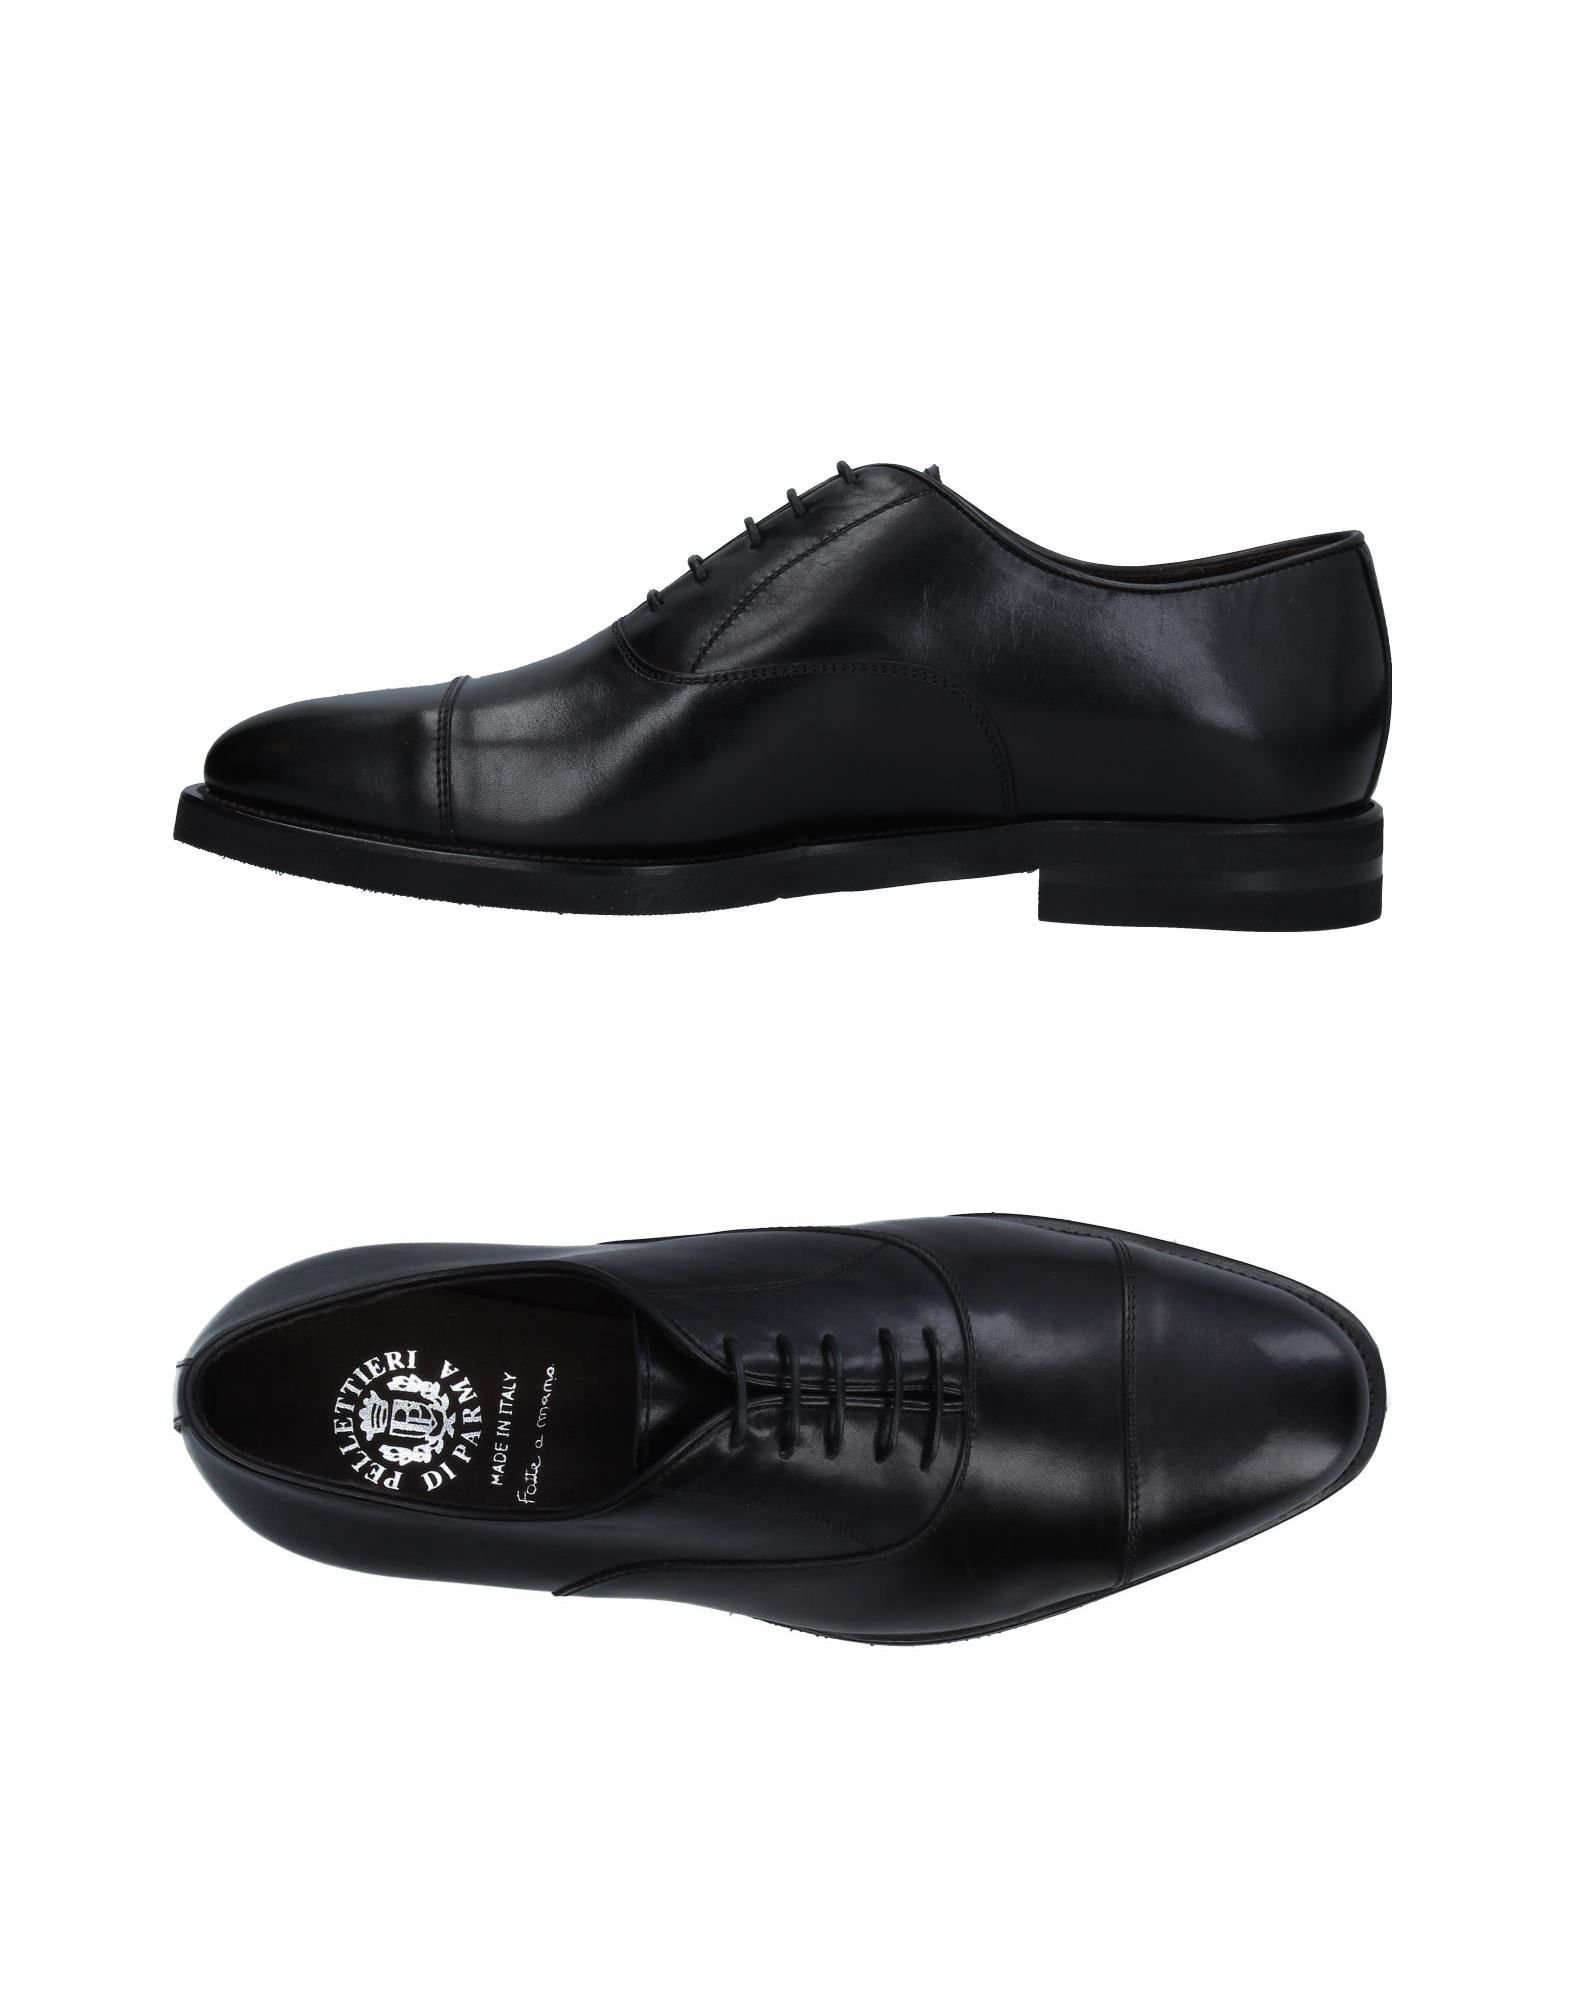 PELLETTIERI di Parma Обувь на шнурках emporio di parma туфли